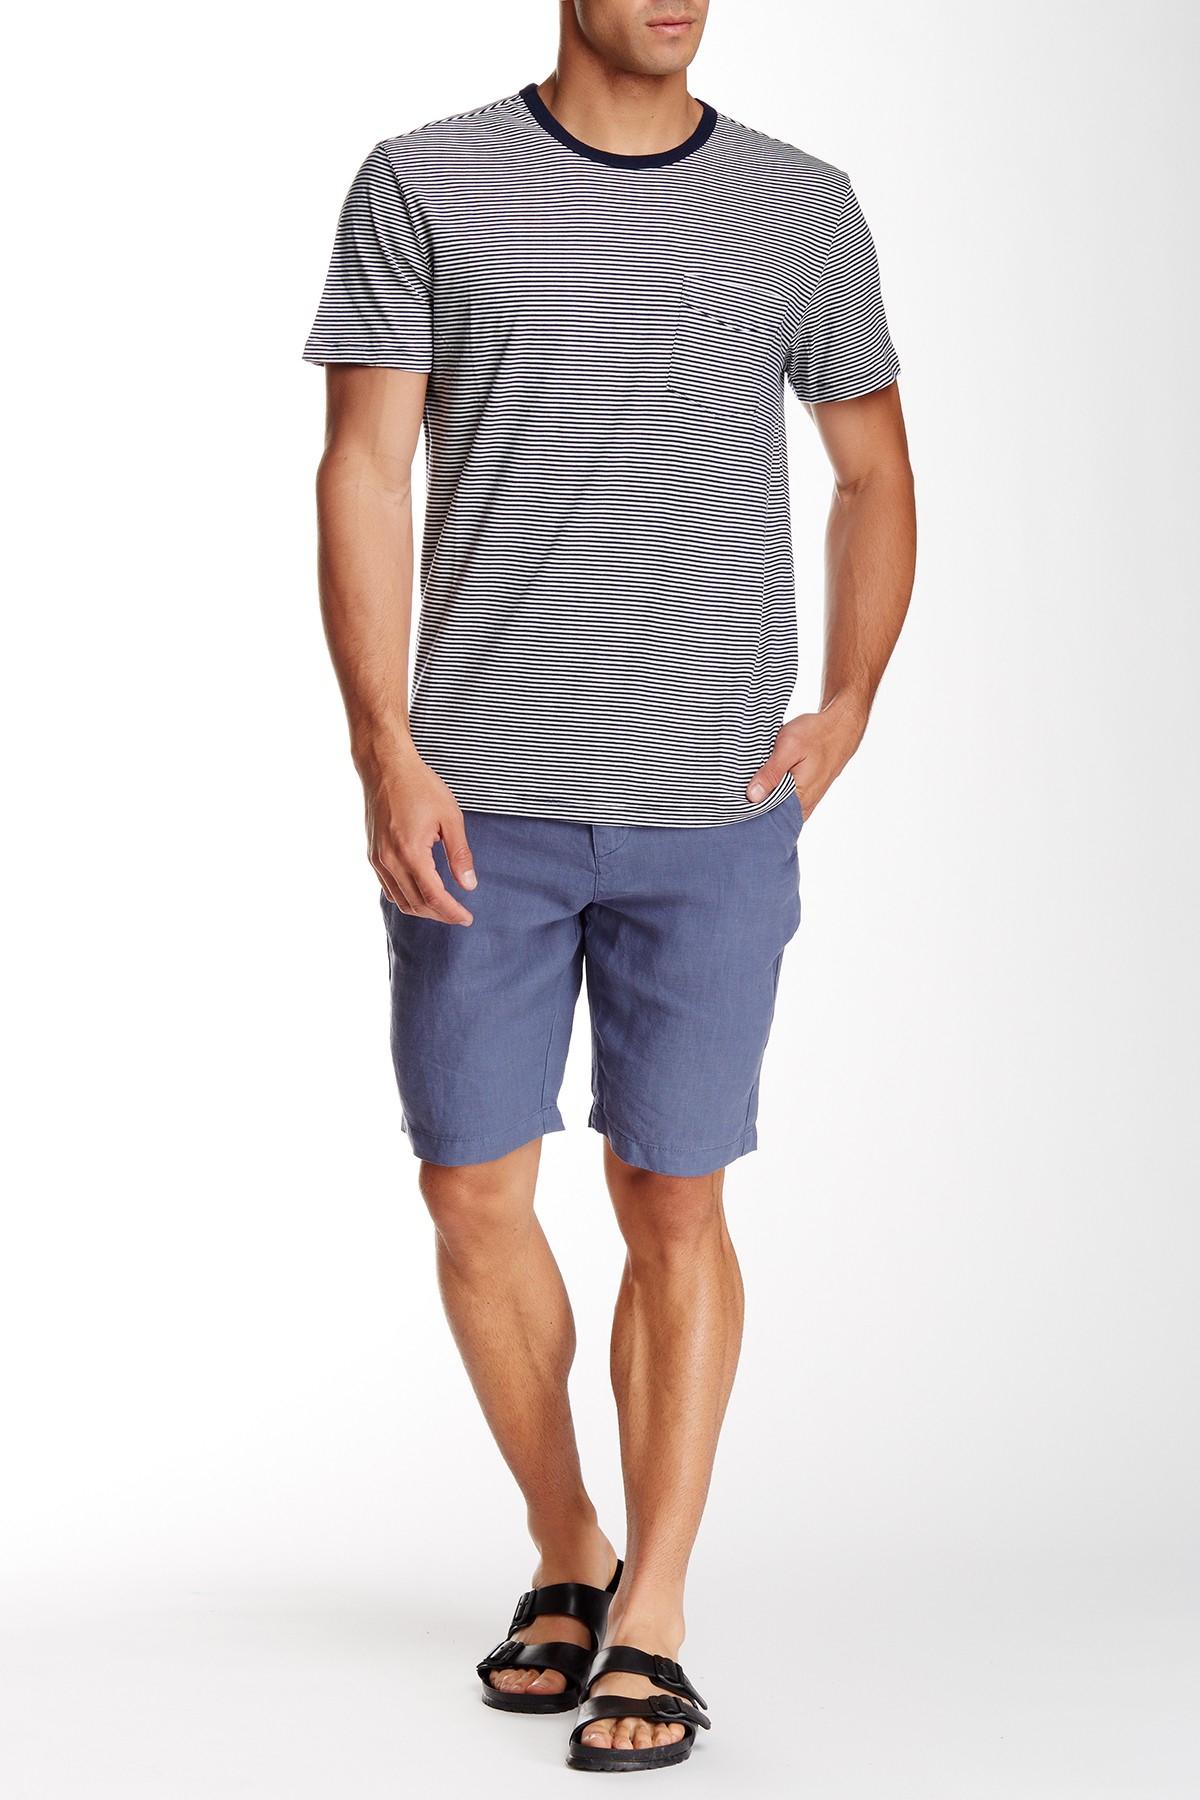 Slate And Stone Clothing : Slate stone cooper linen short in blue for men lyst